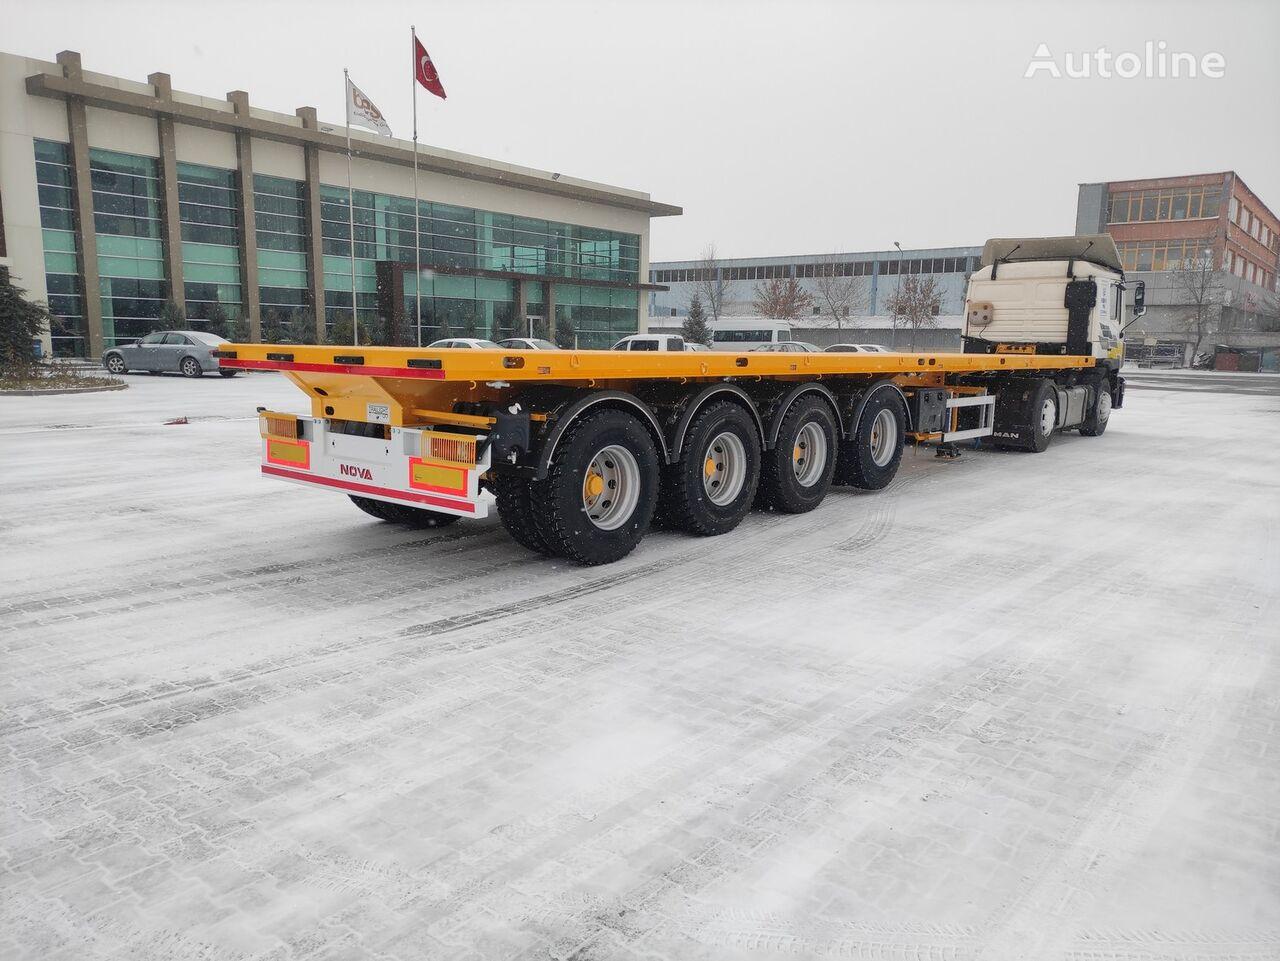 new NOVA NEW FLATBED TRAILER 4 AXLE PRODUCTION platform semi-trailer